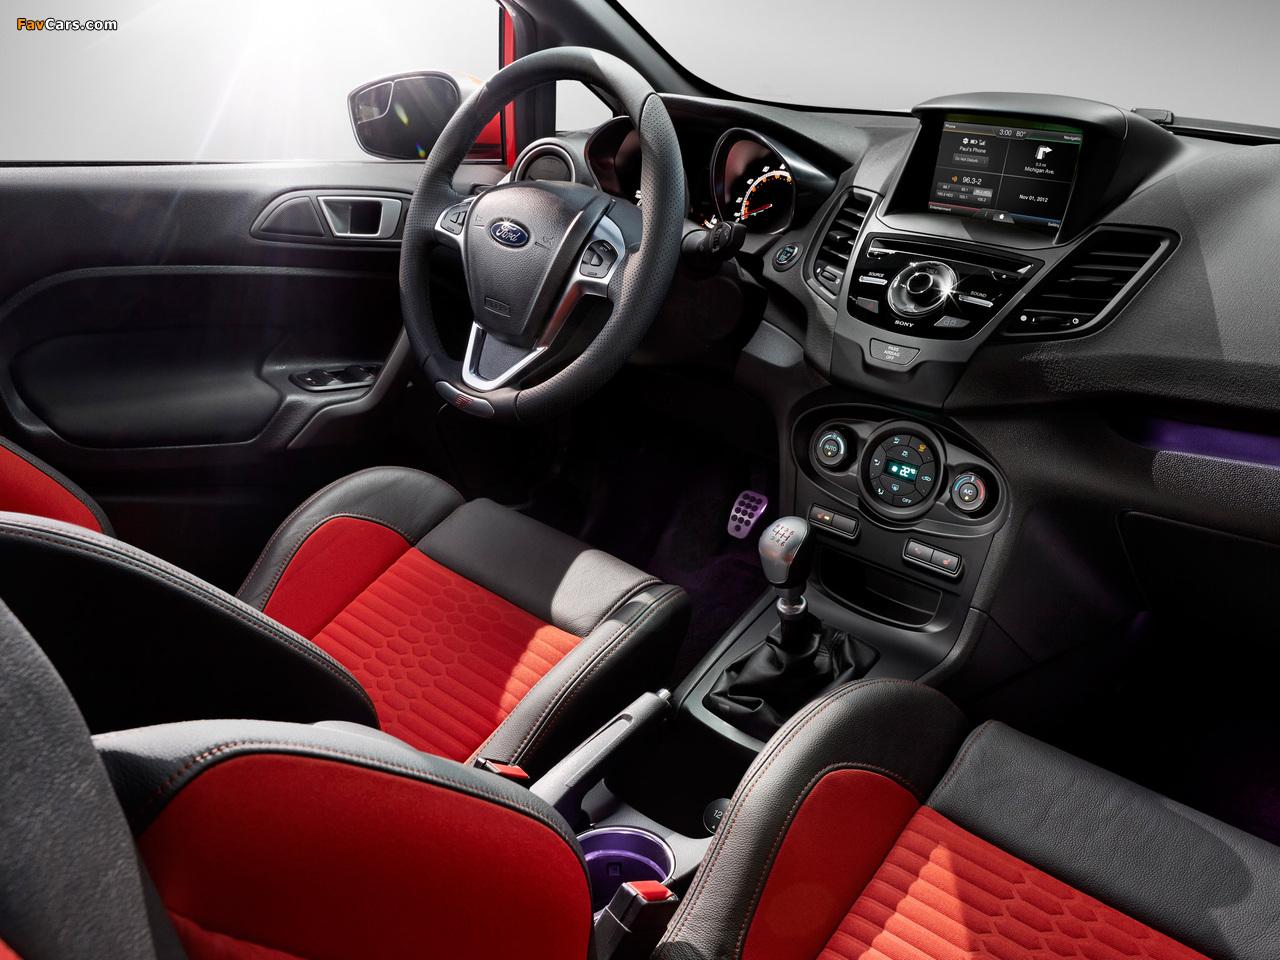 2016 ford mustang interior u s news amp world report - 2014 Ford Fiesta Interior Us News Amp World Report